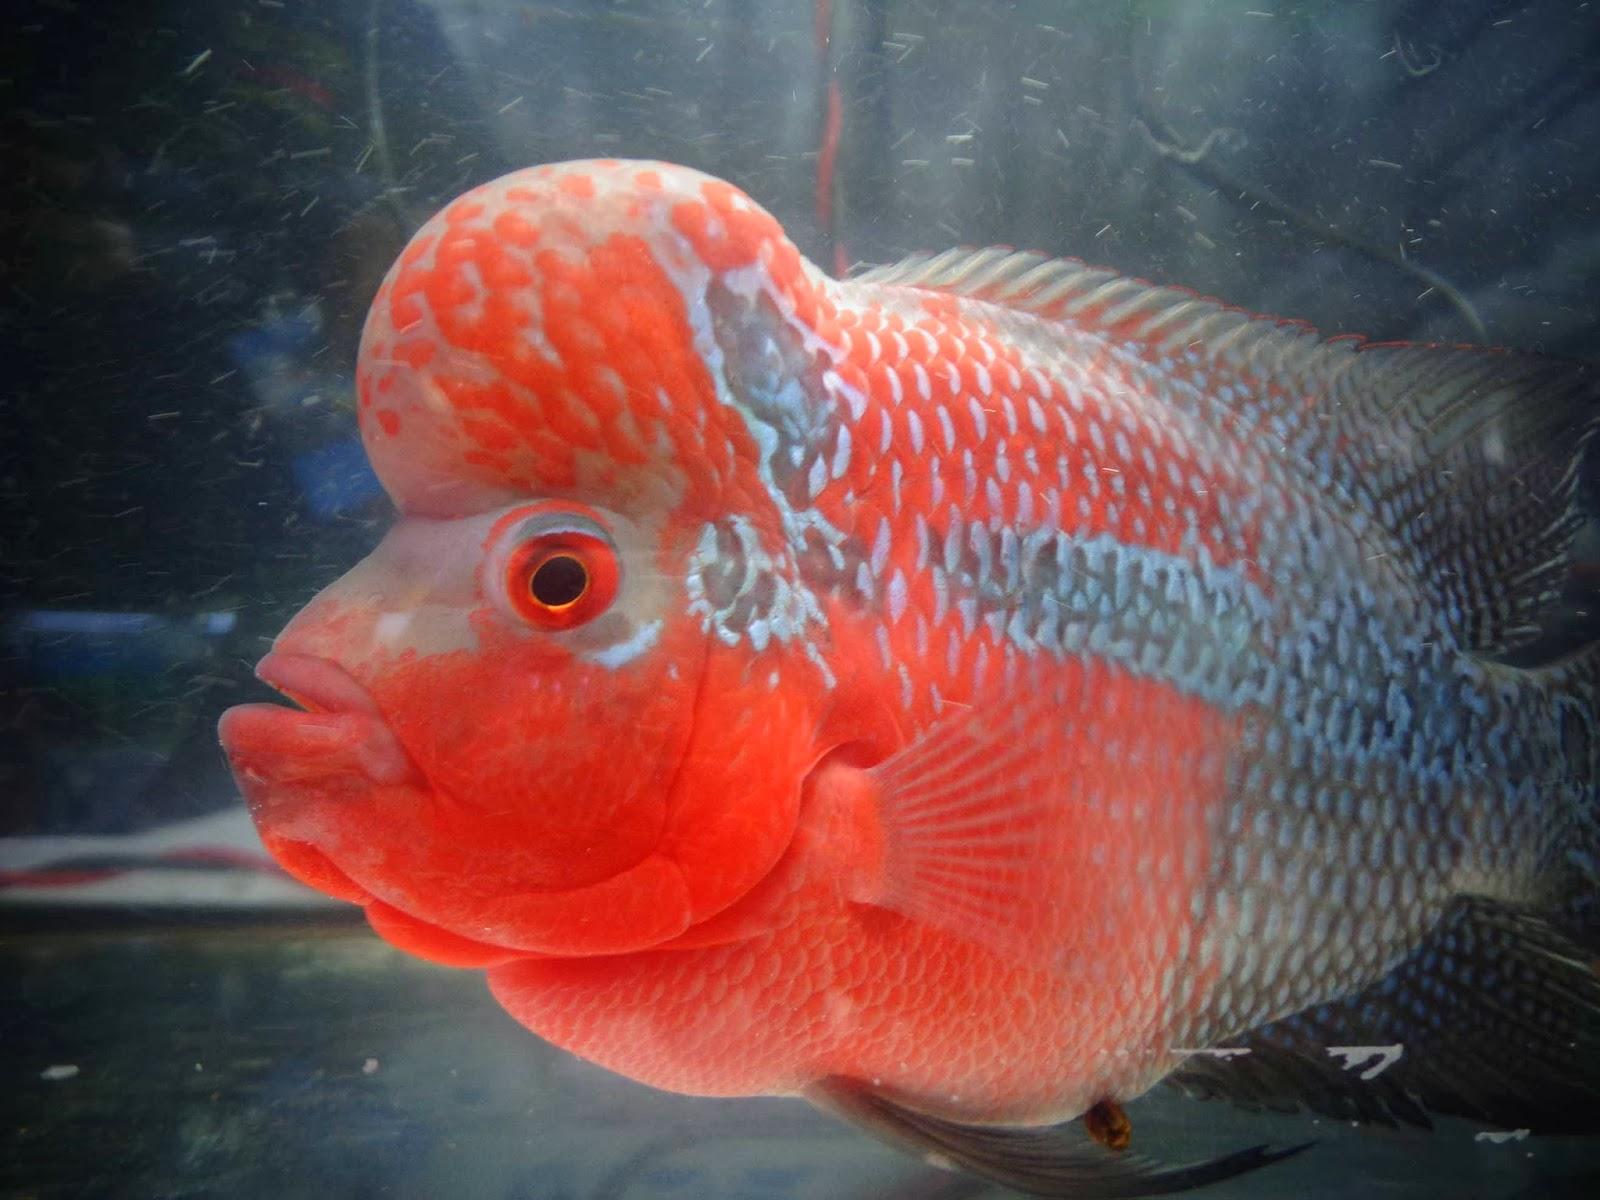 Aqua life Colorful fish exhibition Pune 2013 - Pune & I